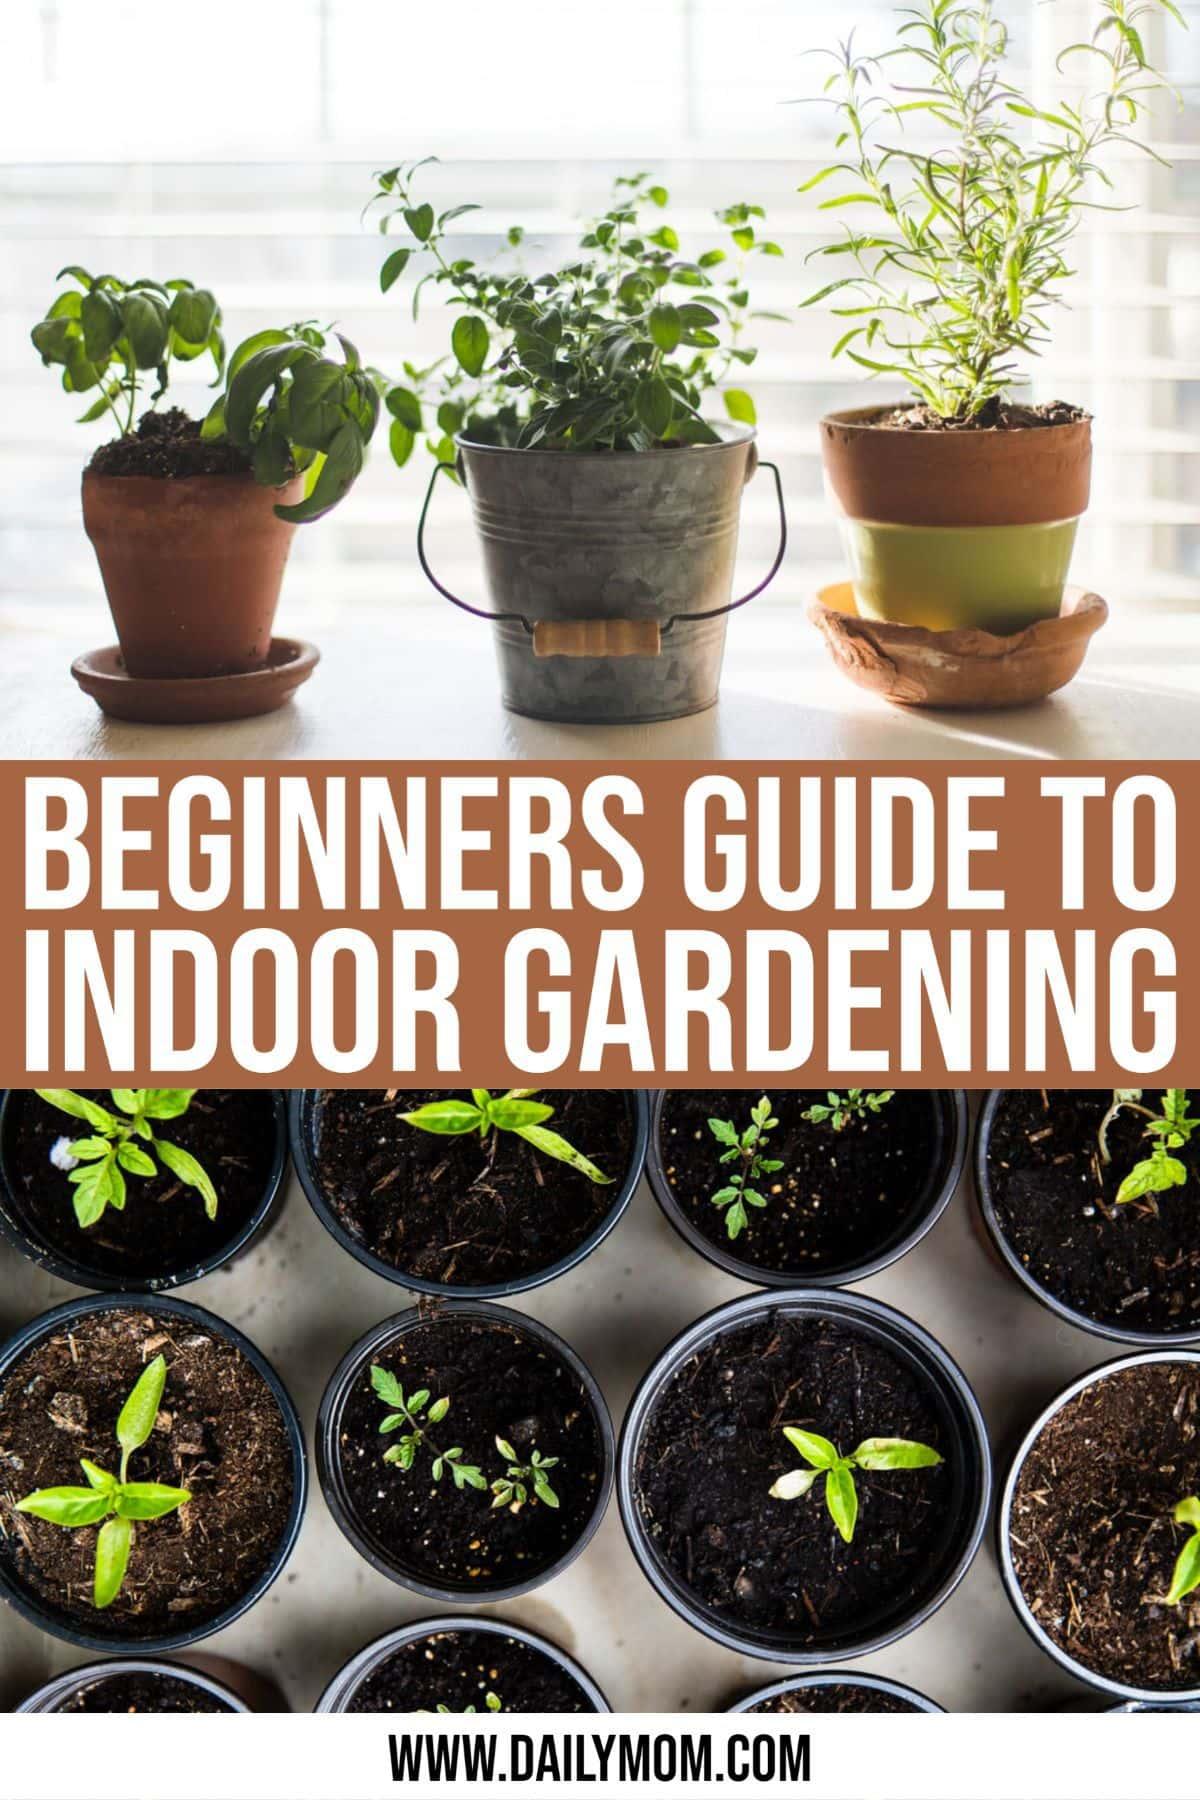 6 Helpful Tips To Get You Indoor Gardening-daily-mom-parent-portal